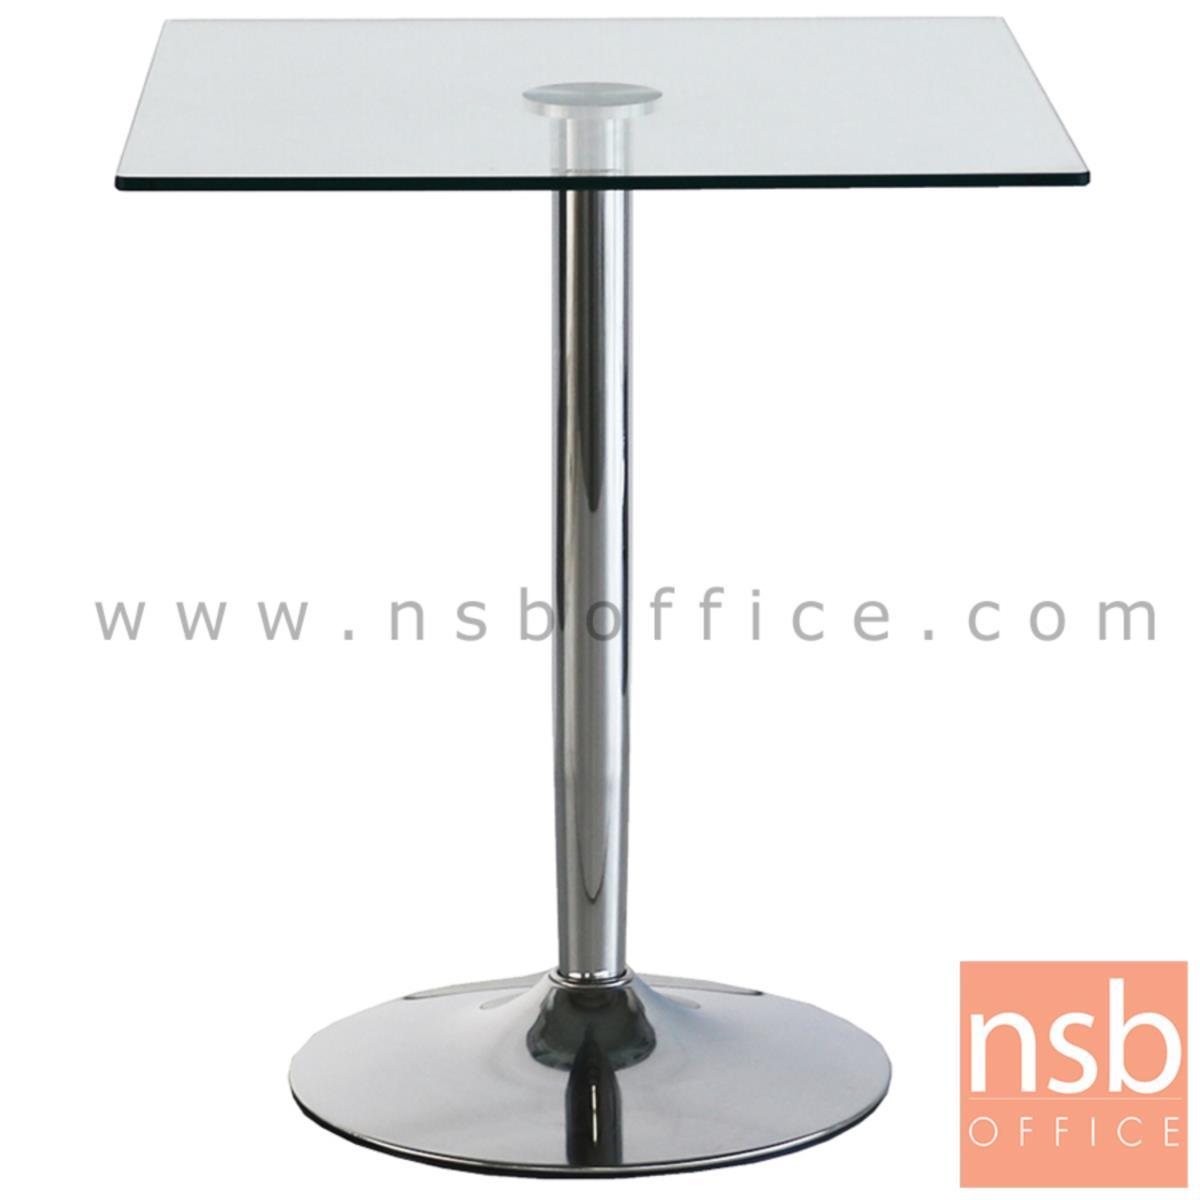 A09A135:โต๊ะเหลี่ยมหน้ากระจก รุ่น PFALZ (ฟัลส์) ขนาด 65W ,80W cm. ขาอลูมิเนียม